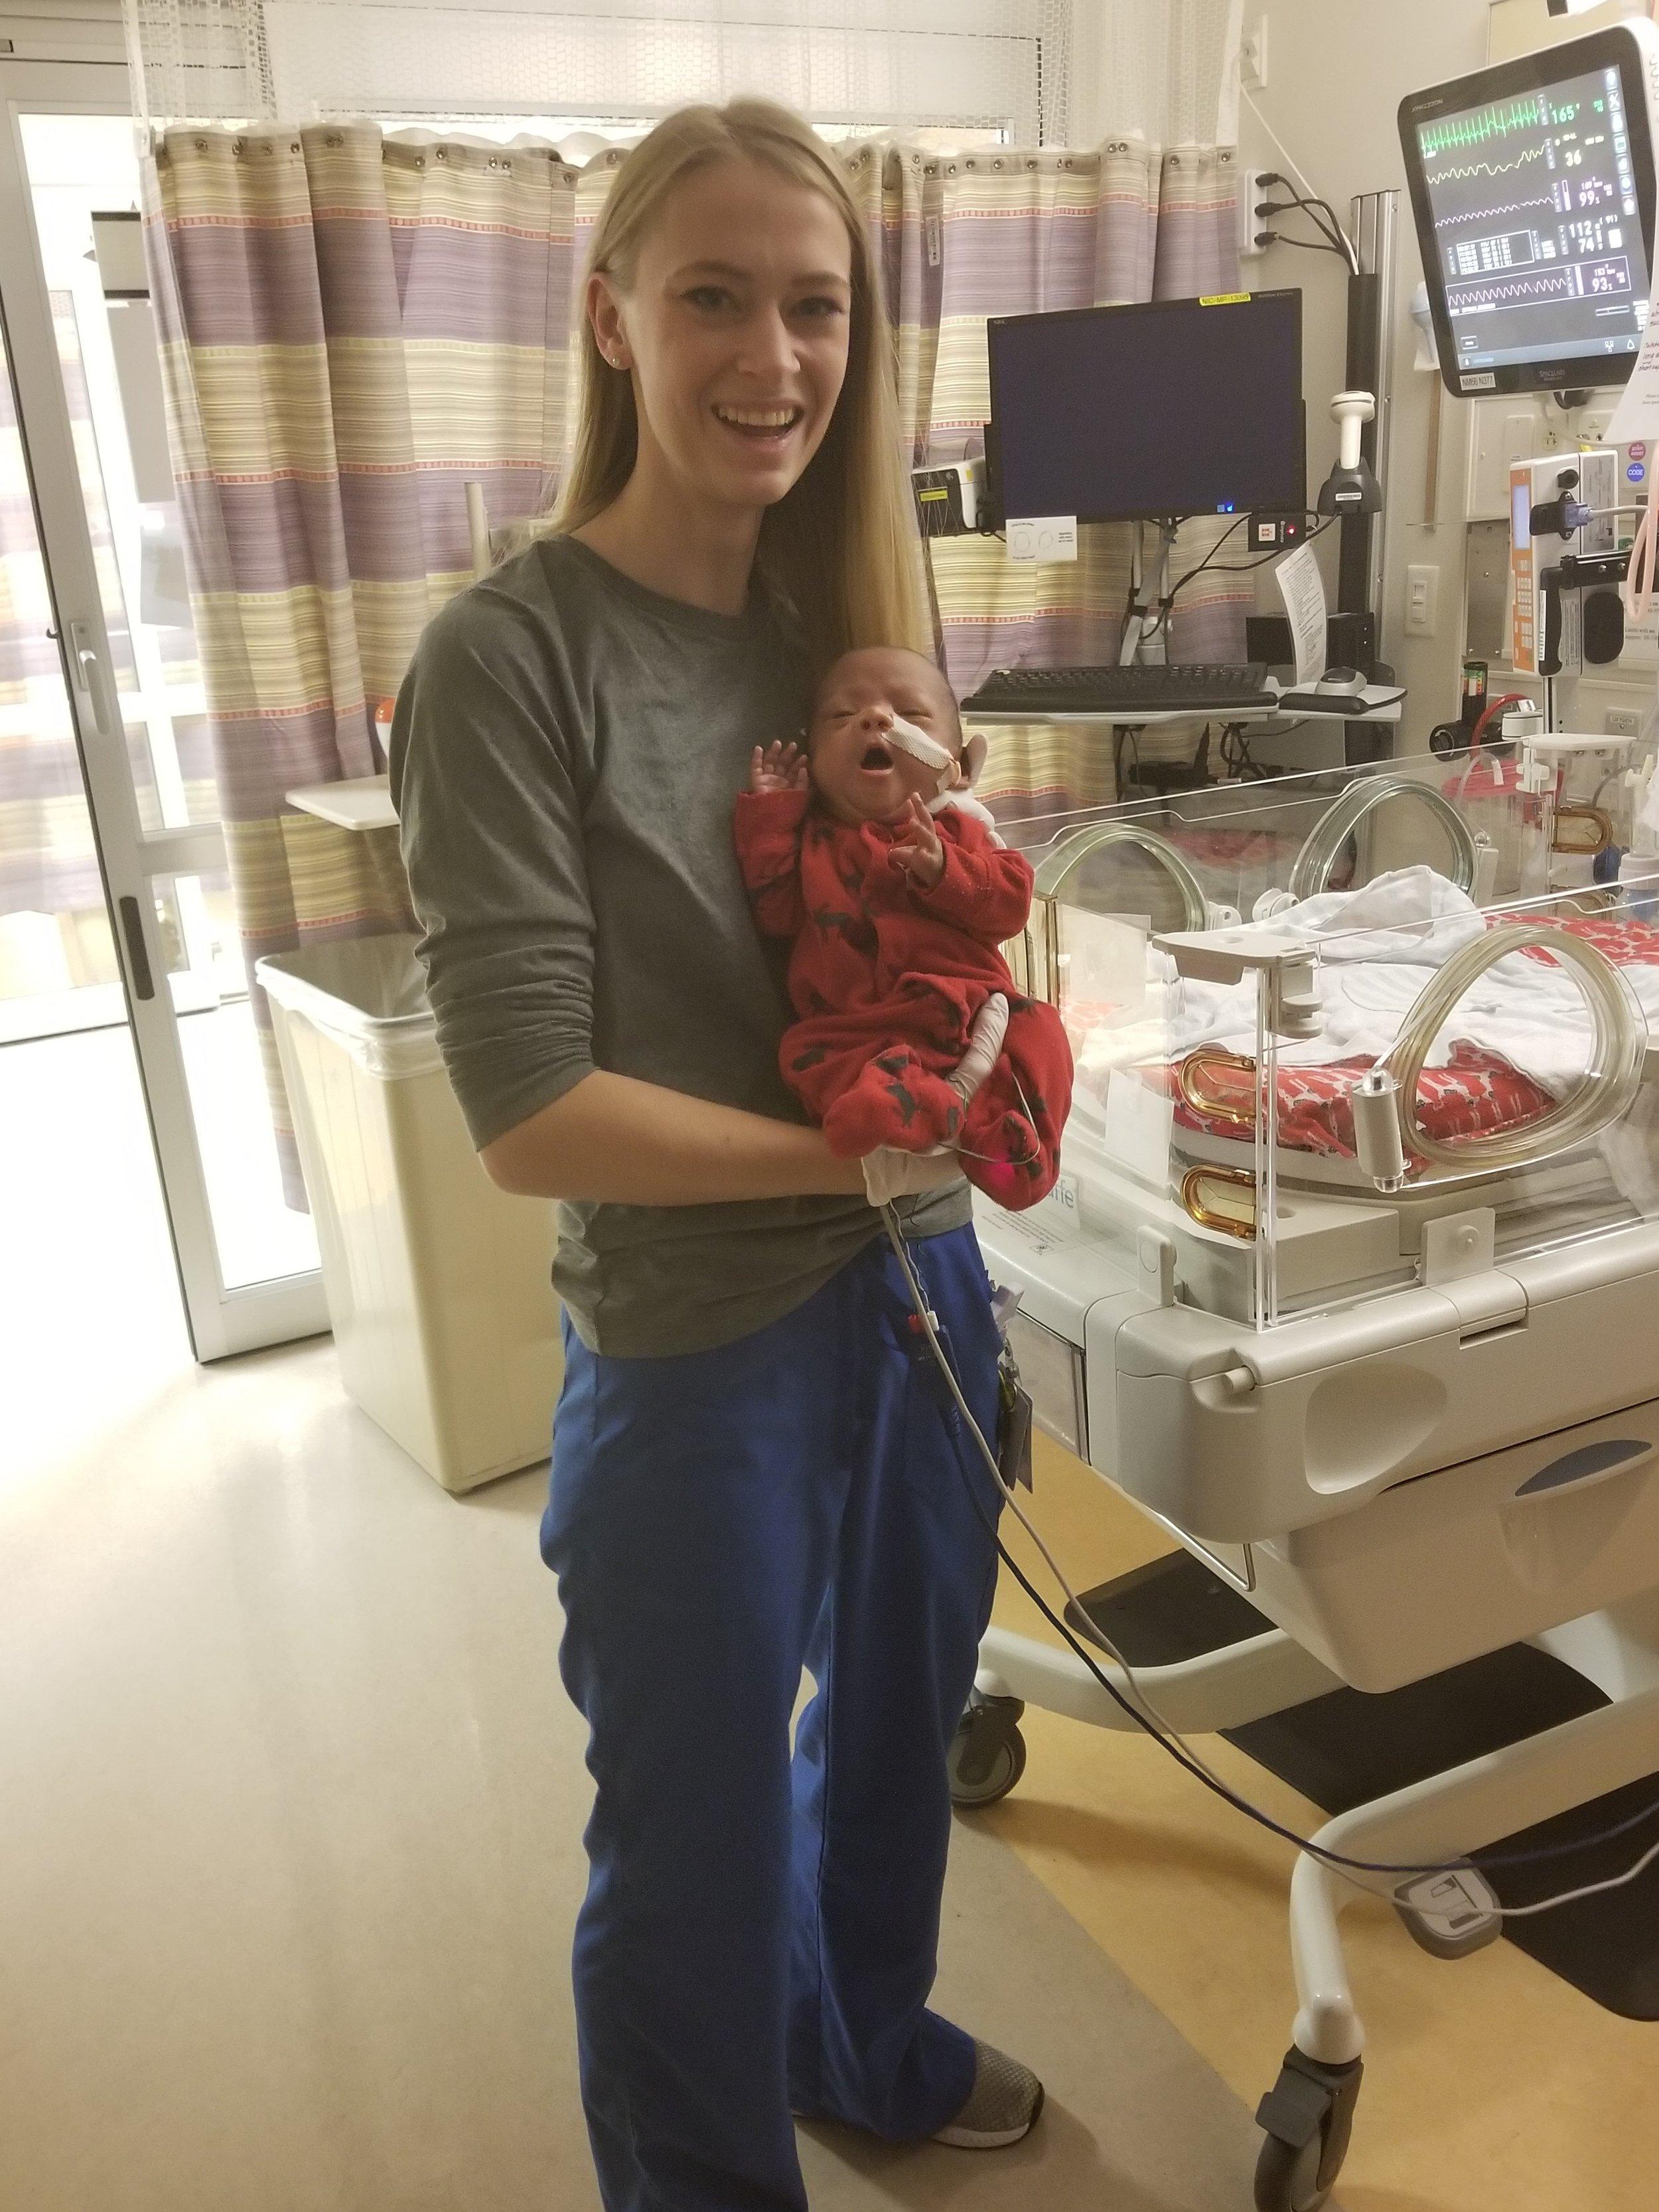 NICU Nurse with baby